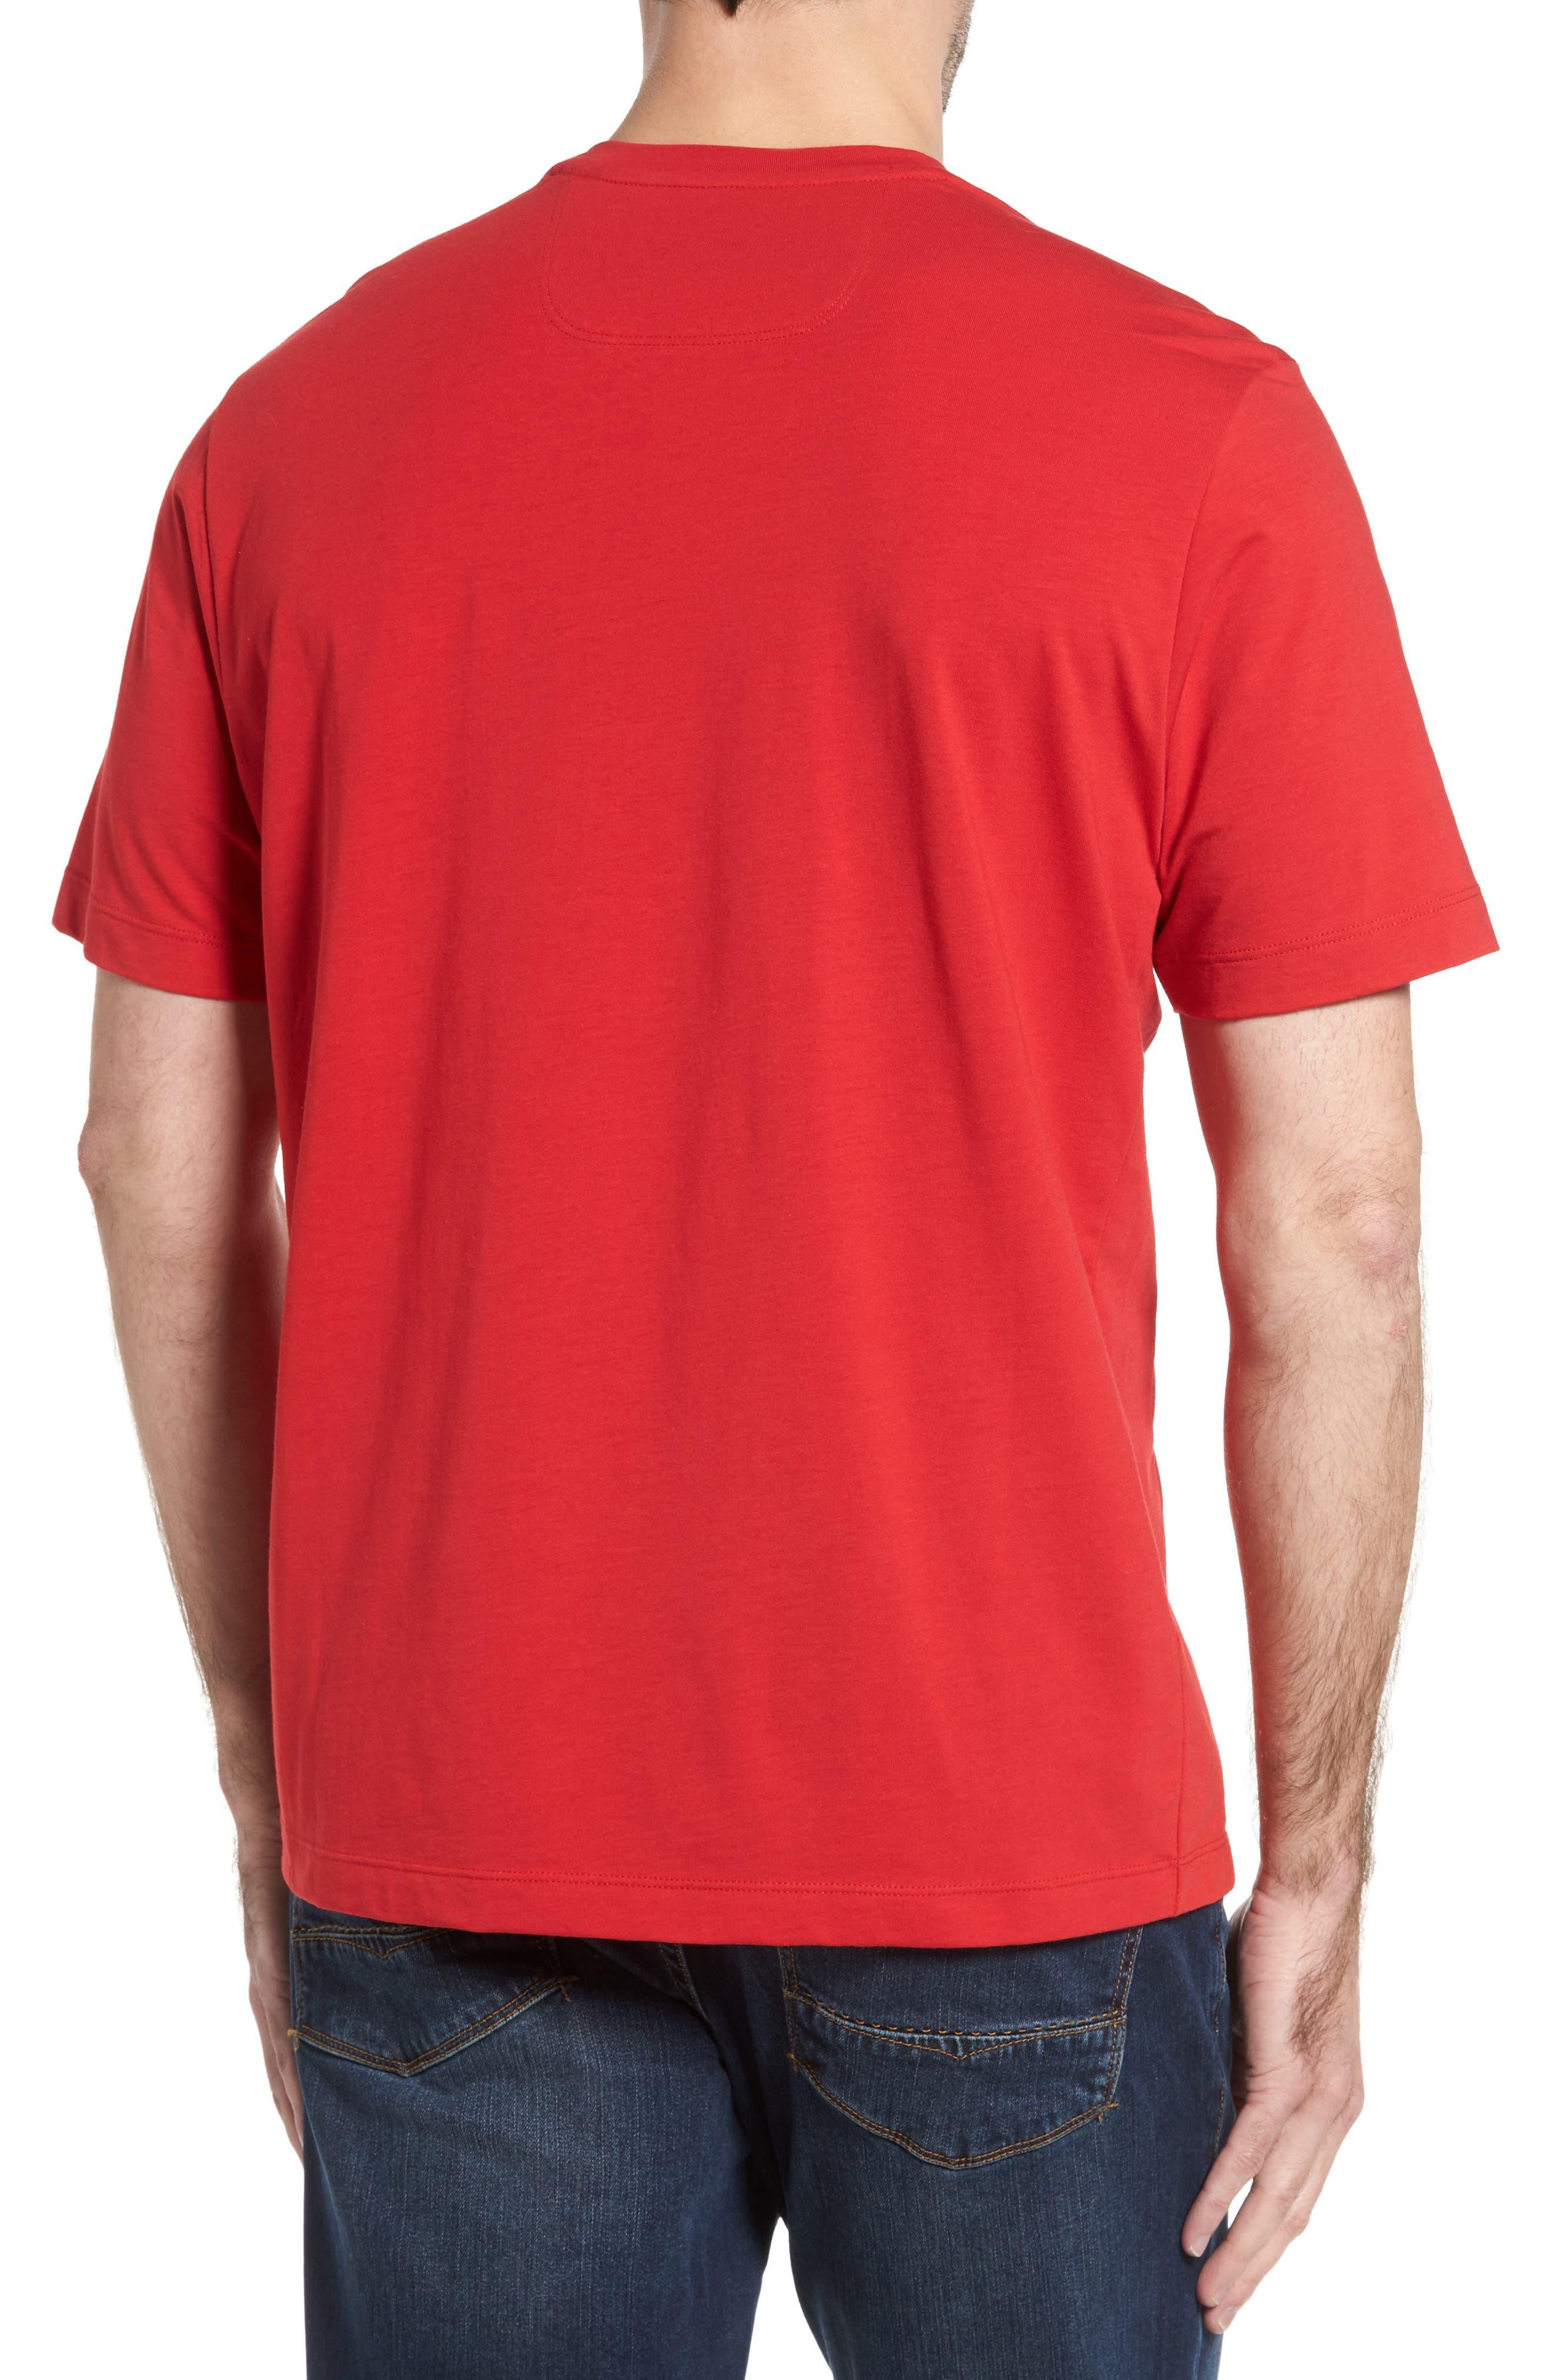 Tropicool T-Shirt,                             Alternate thumbnail 20, color,